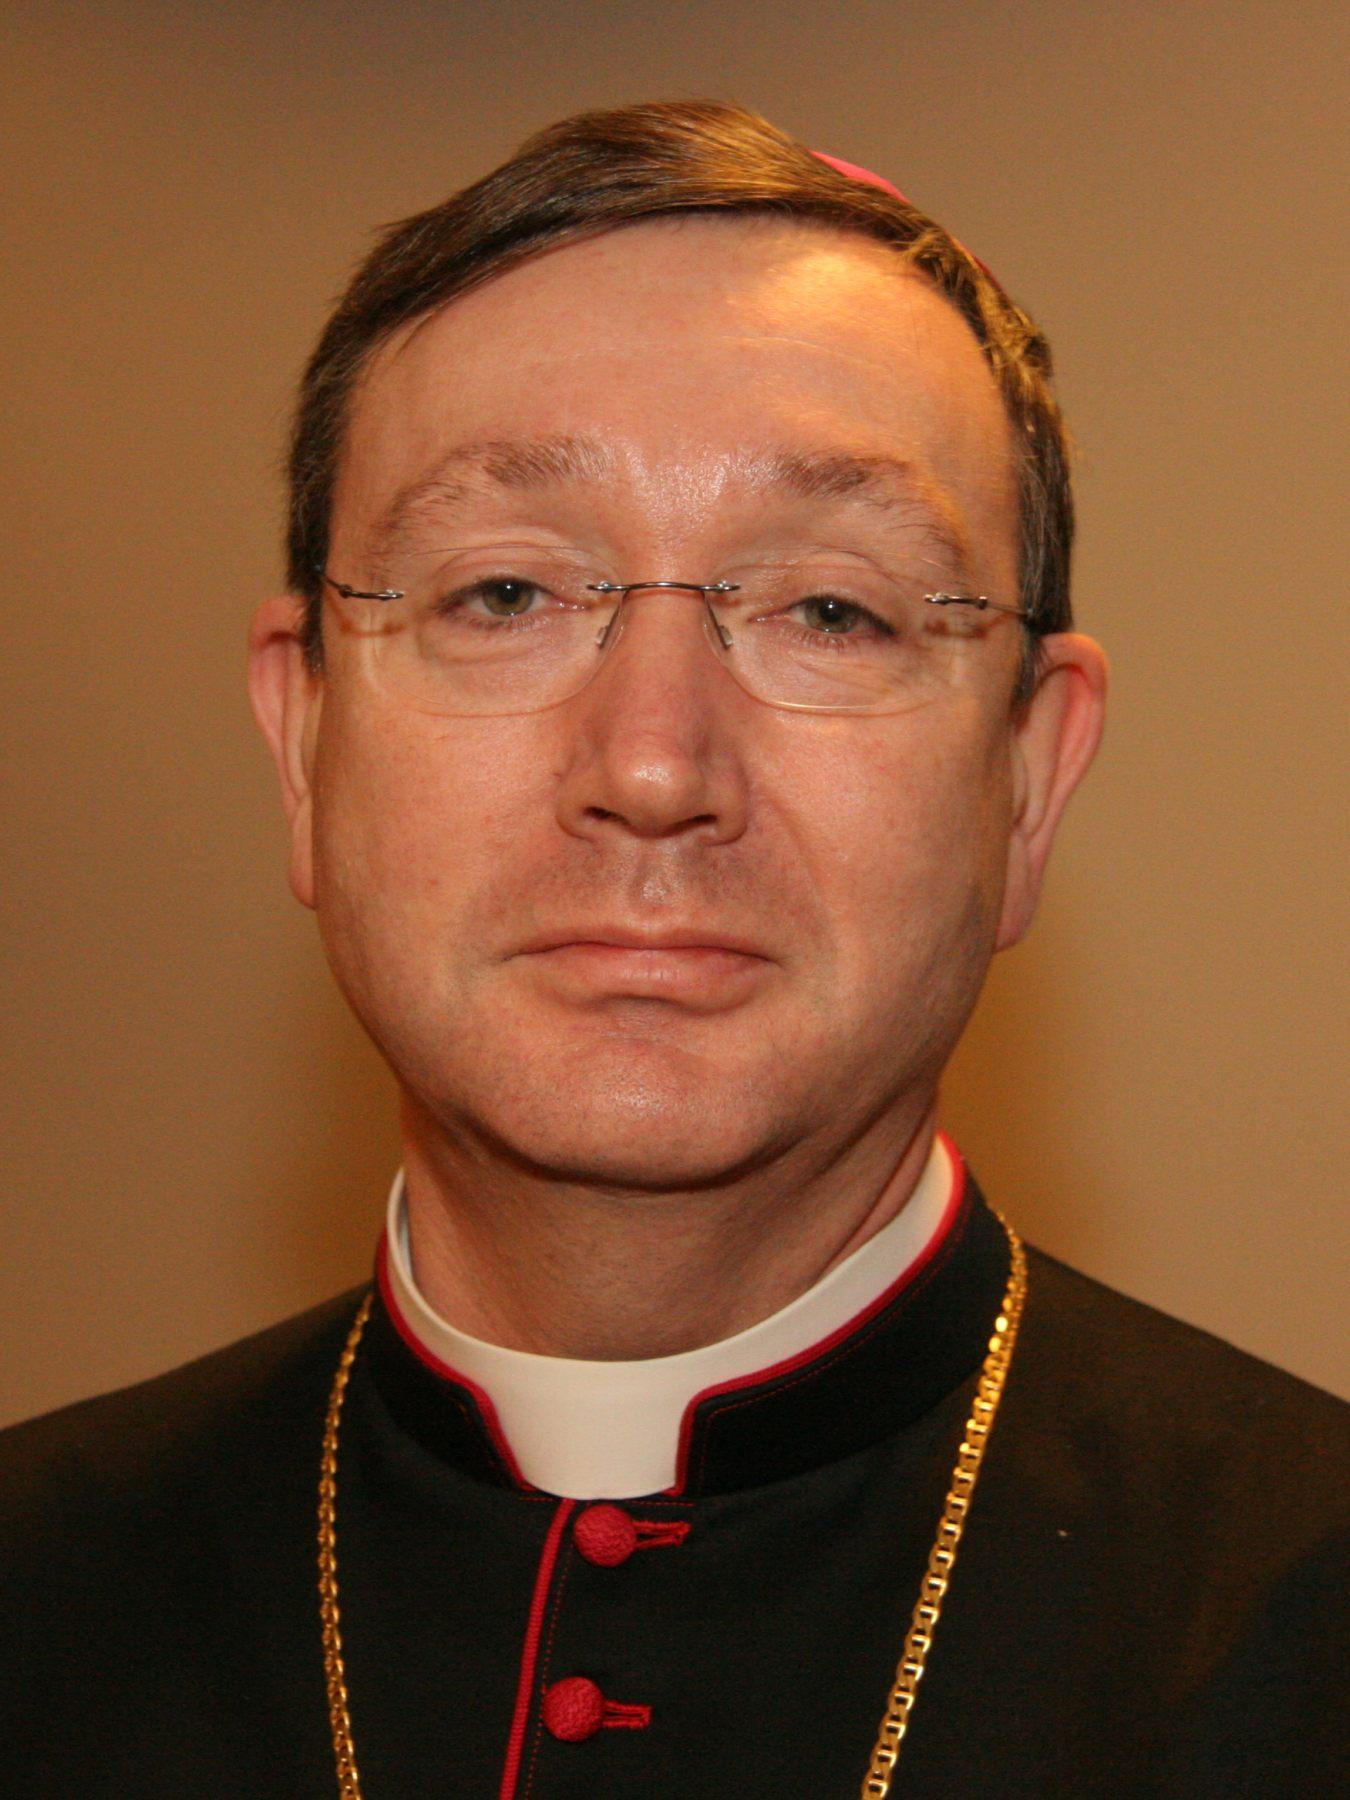 Foto: Peter Tálos 31. januar 2006